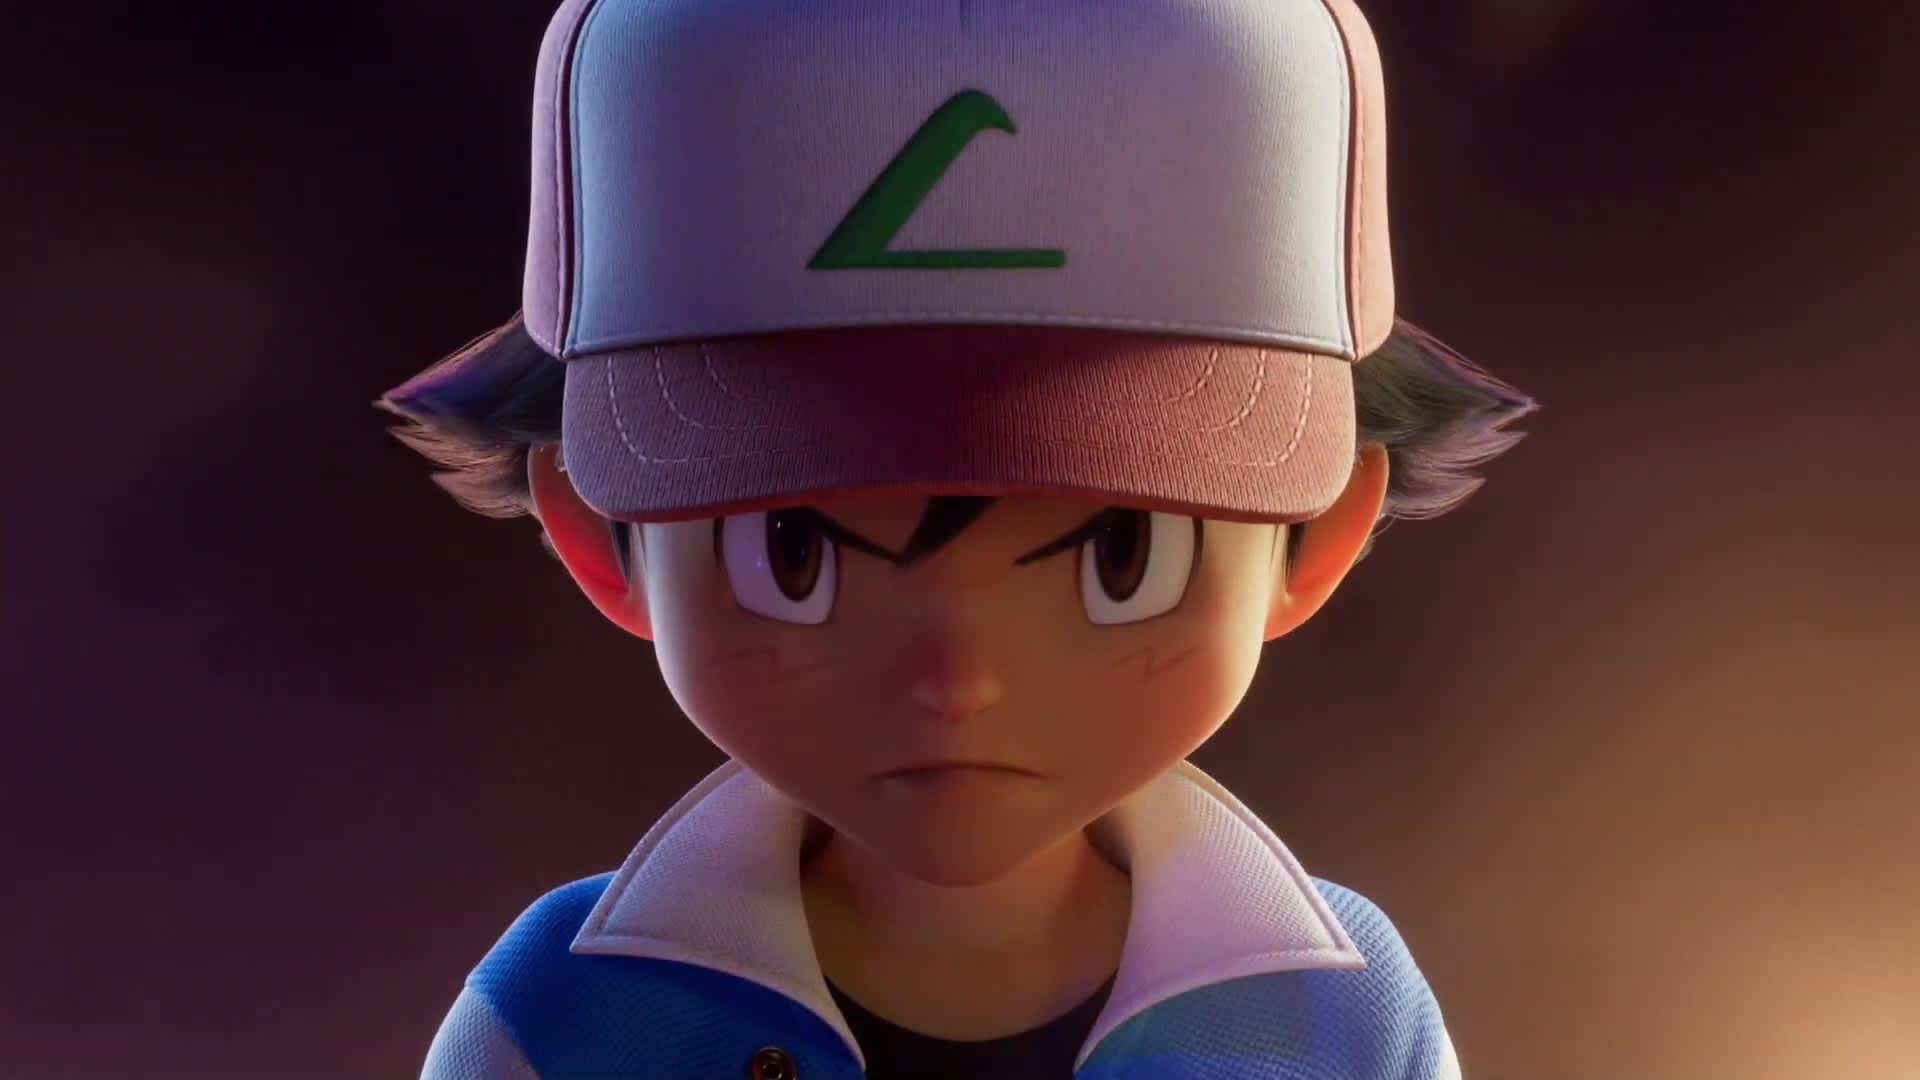 New Trailer For Mewtwo Strikes Back Evolution Is Full Of Pokemon Nostalgia Engadget